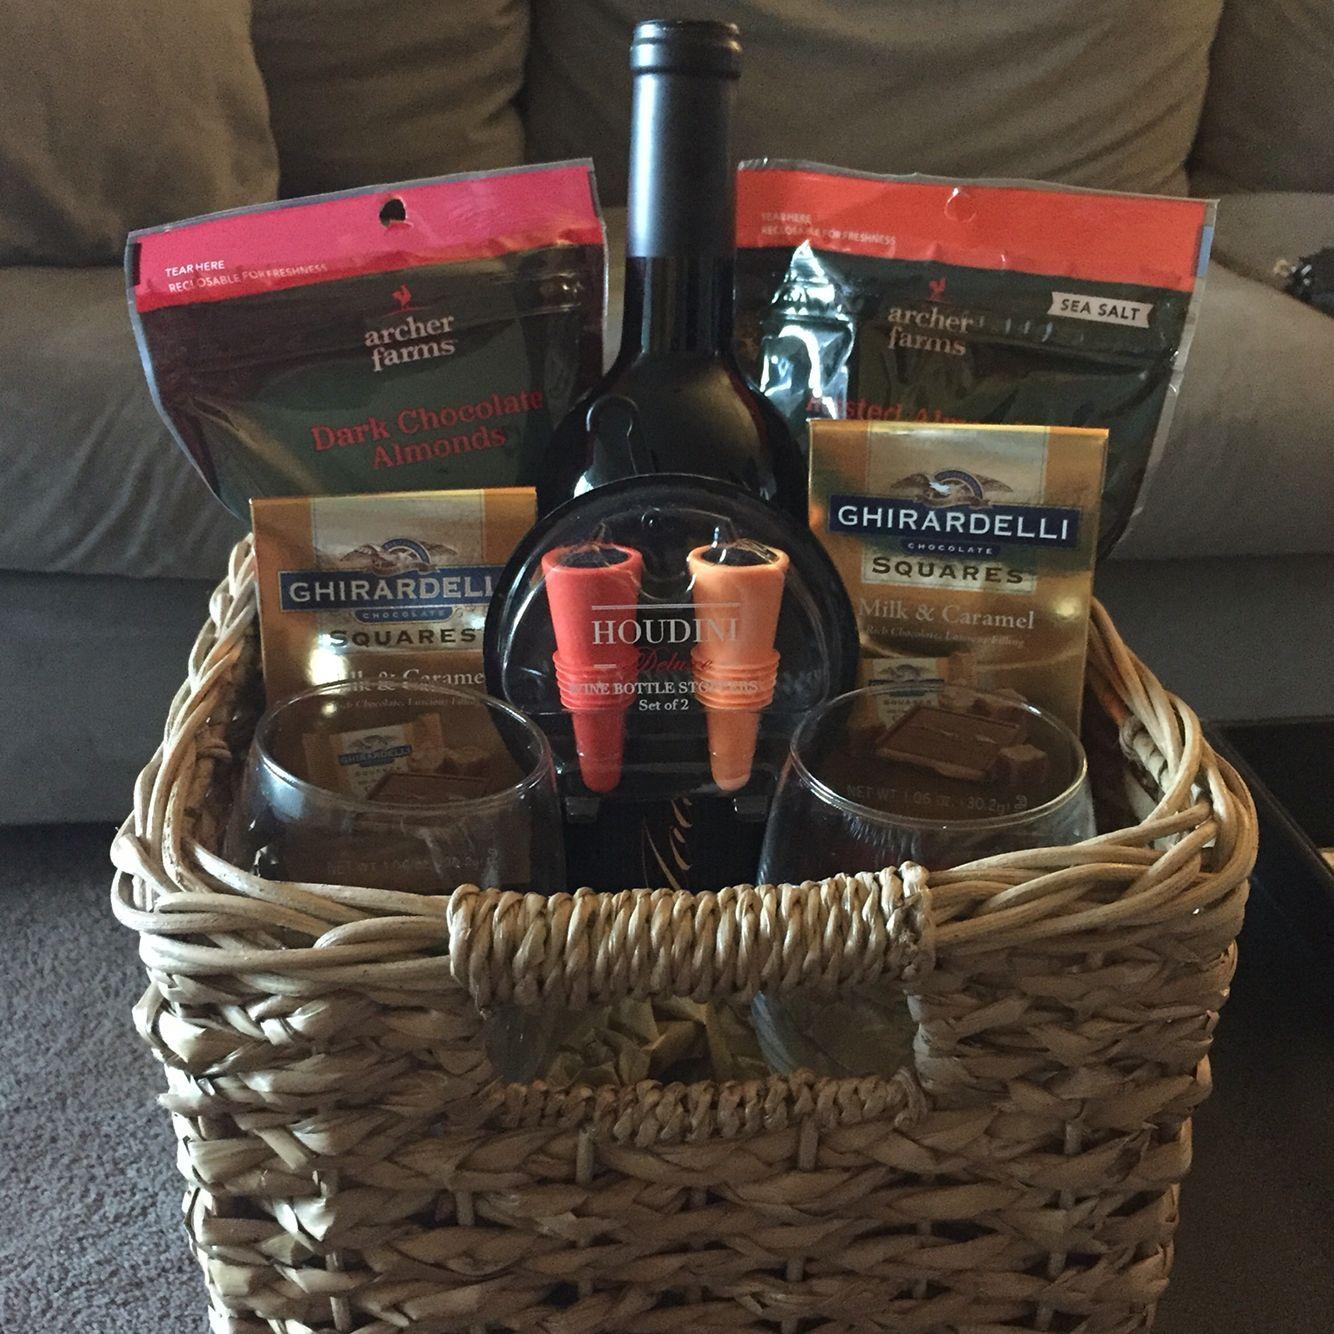 Wine Basket includes: Stemless wine glasses, wine bottle, almonds ...